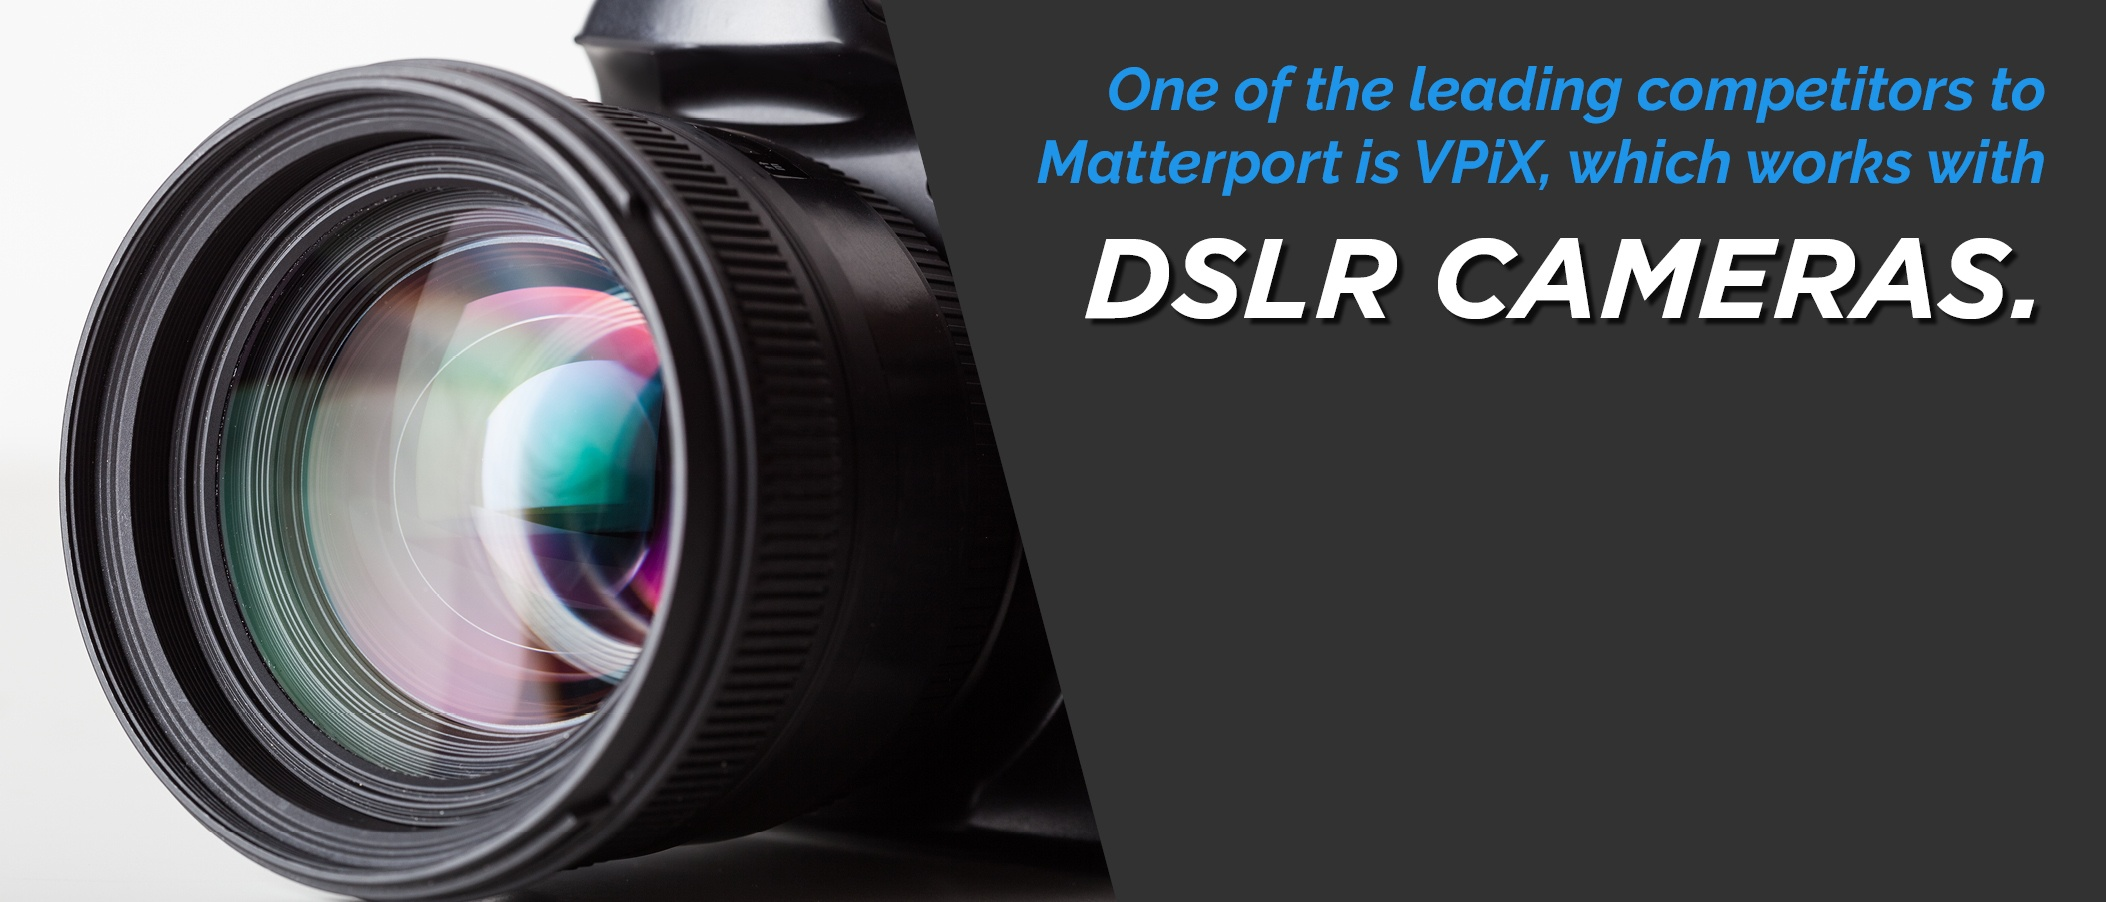 3 DSLR Camera